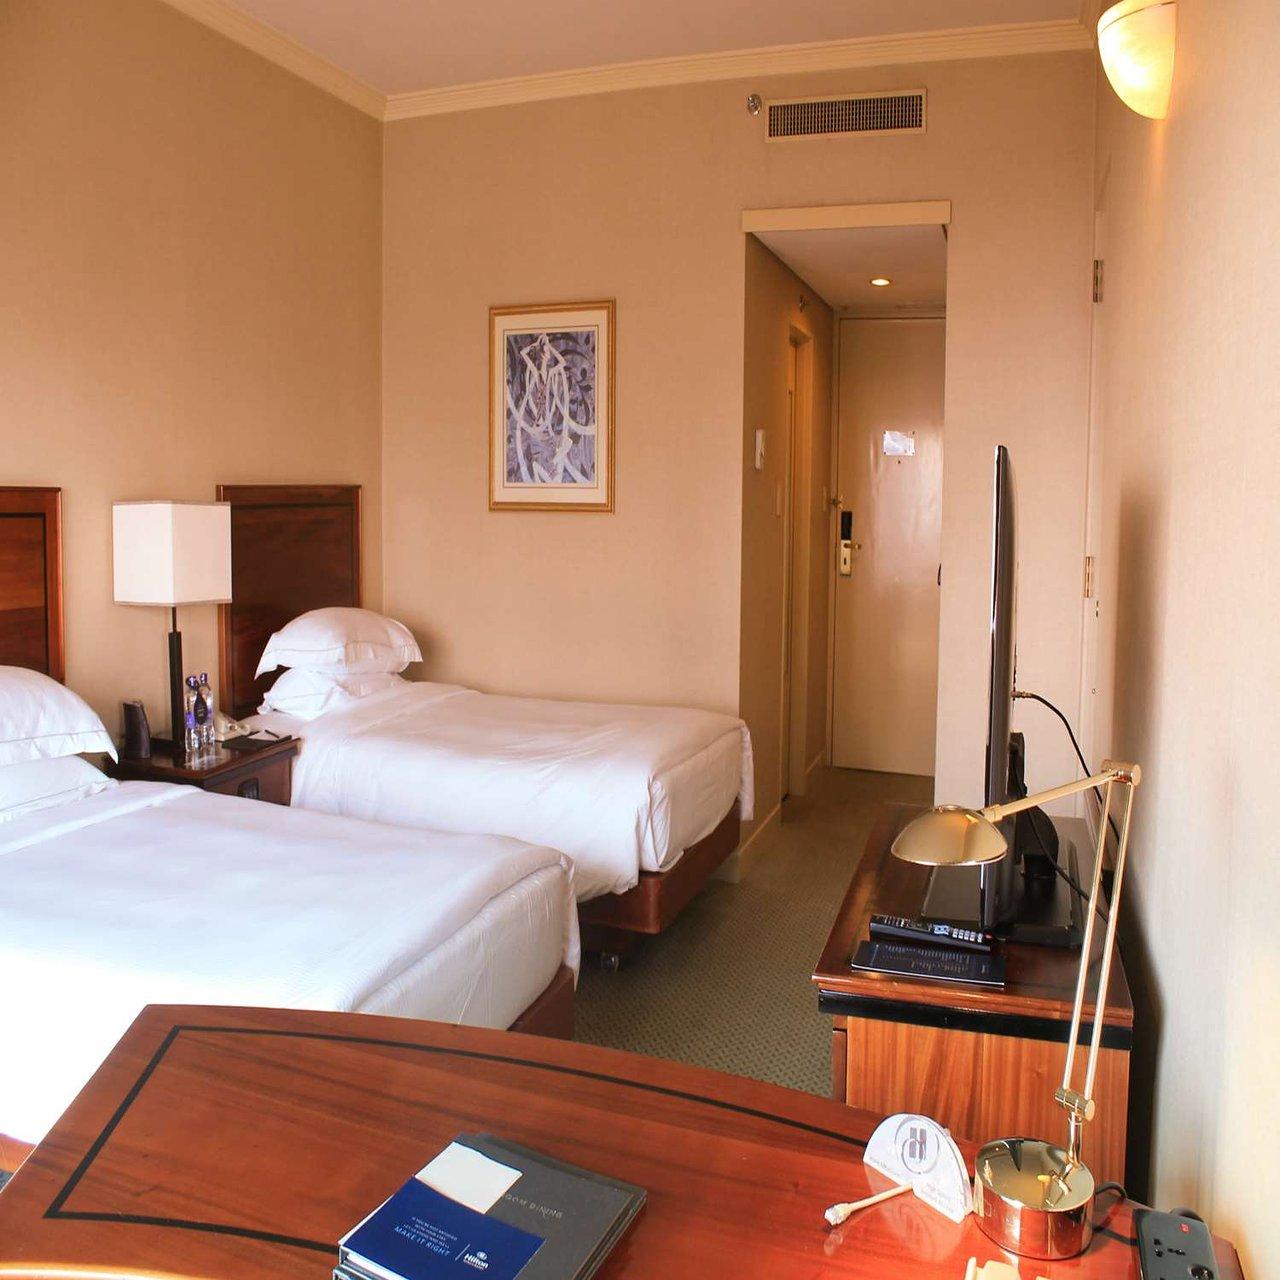 rooms dating colombo taurus dating taurus